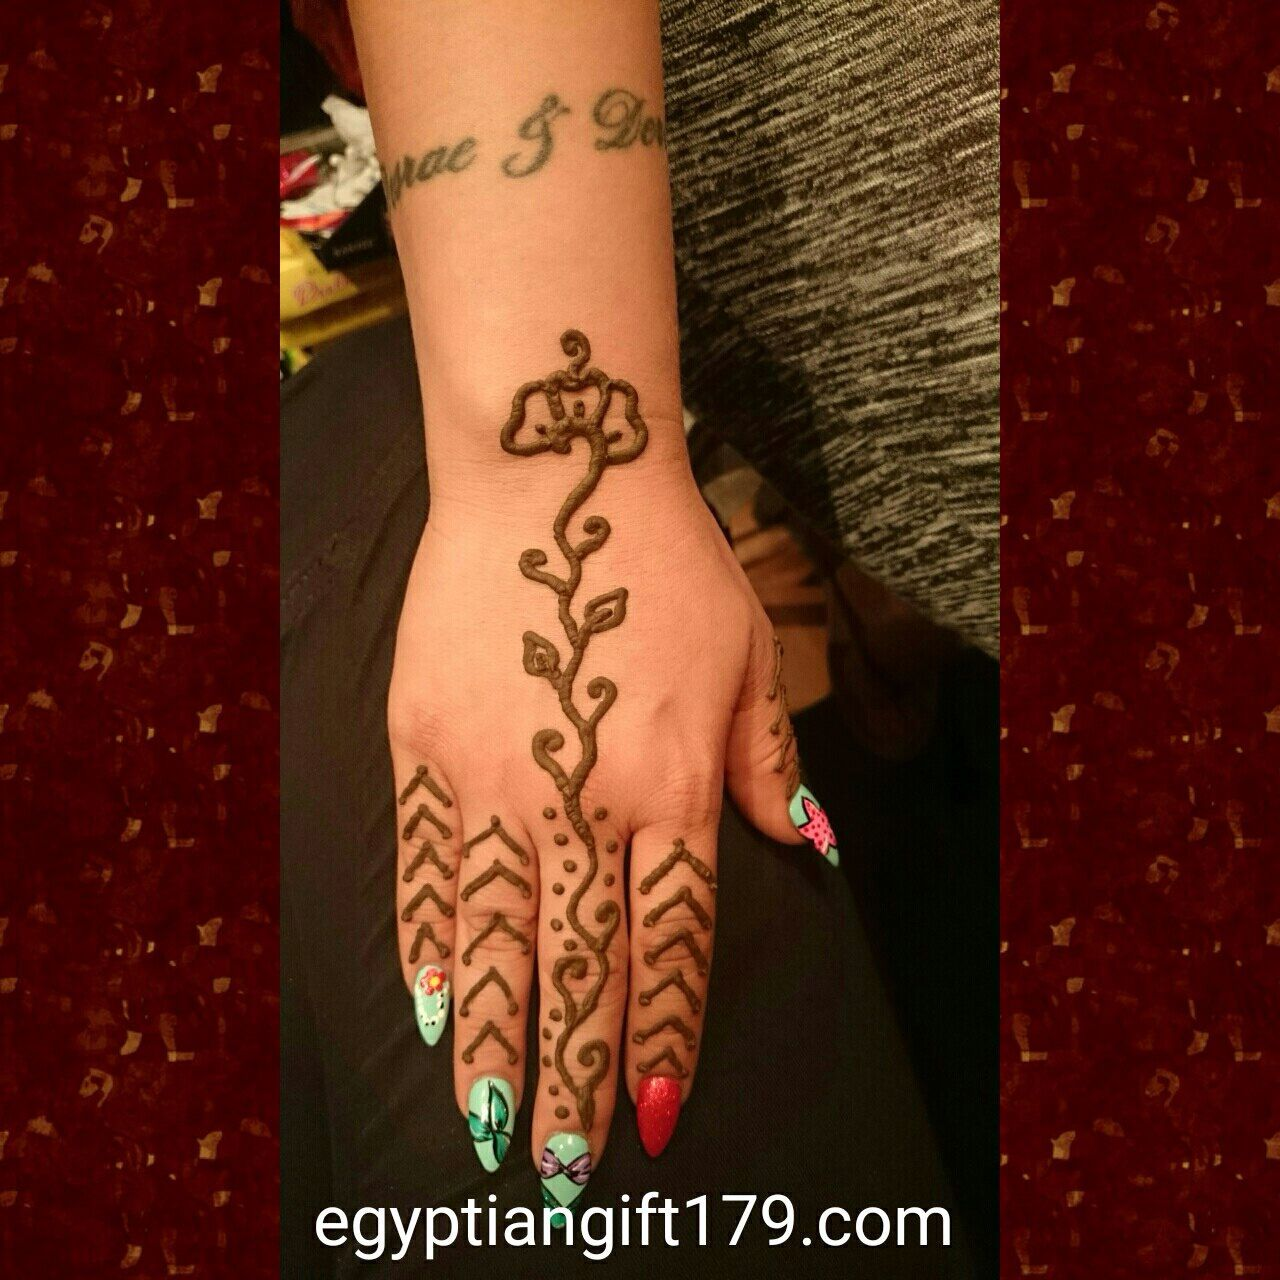 Egyptian gift corner henna shop henna kit tattoos